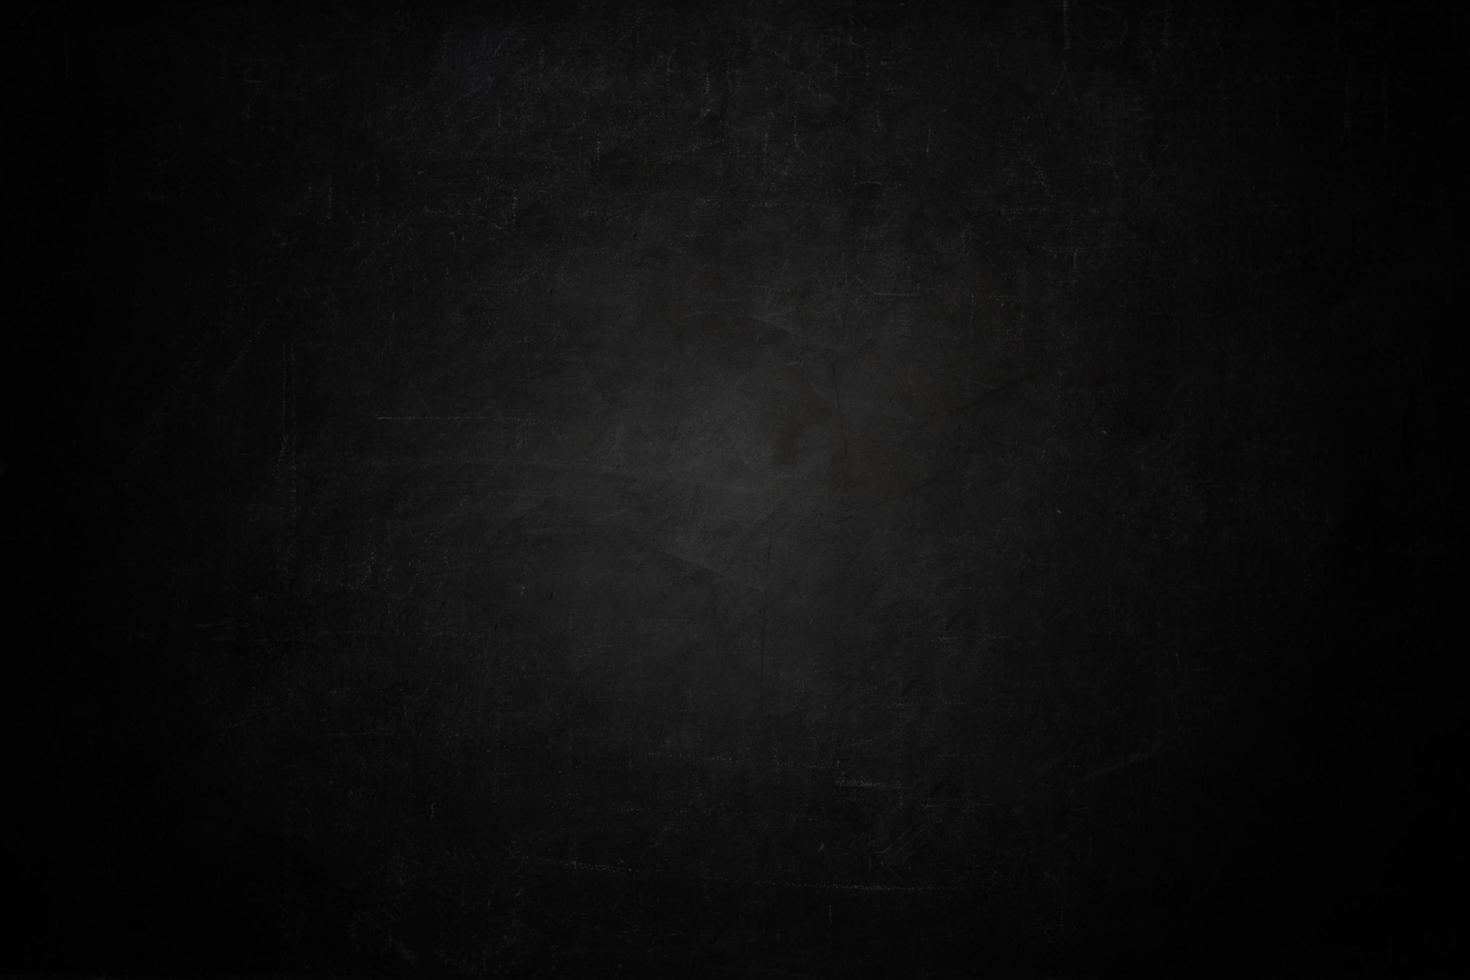 donkere schoolbordoppervlak foto